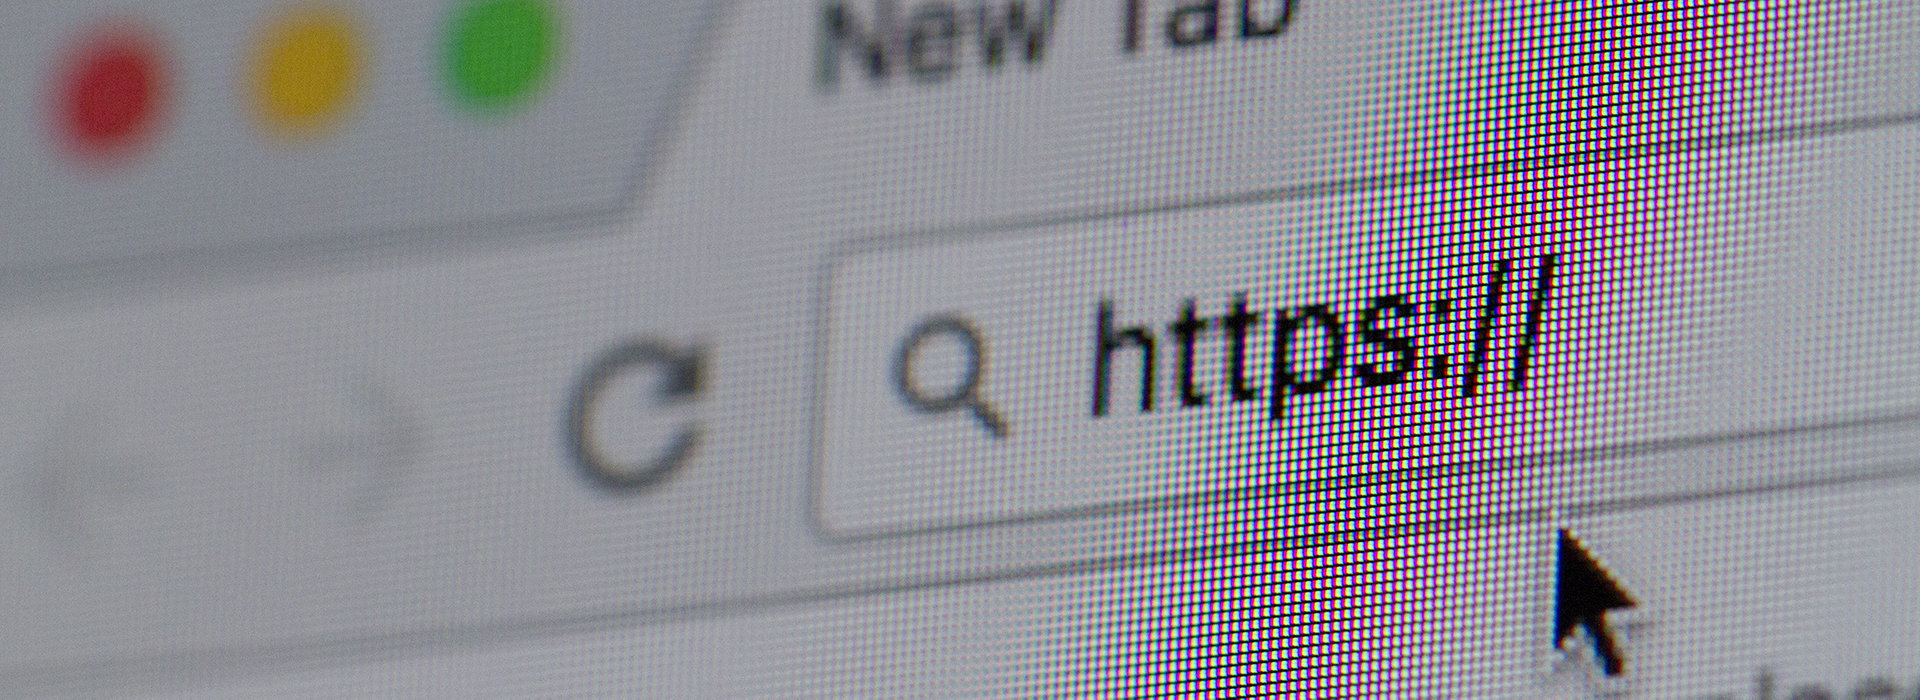 domain-name-solicitation-fraud-brand-owners-beware_ip-update_531456541